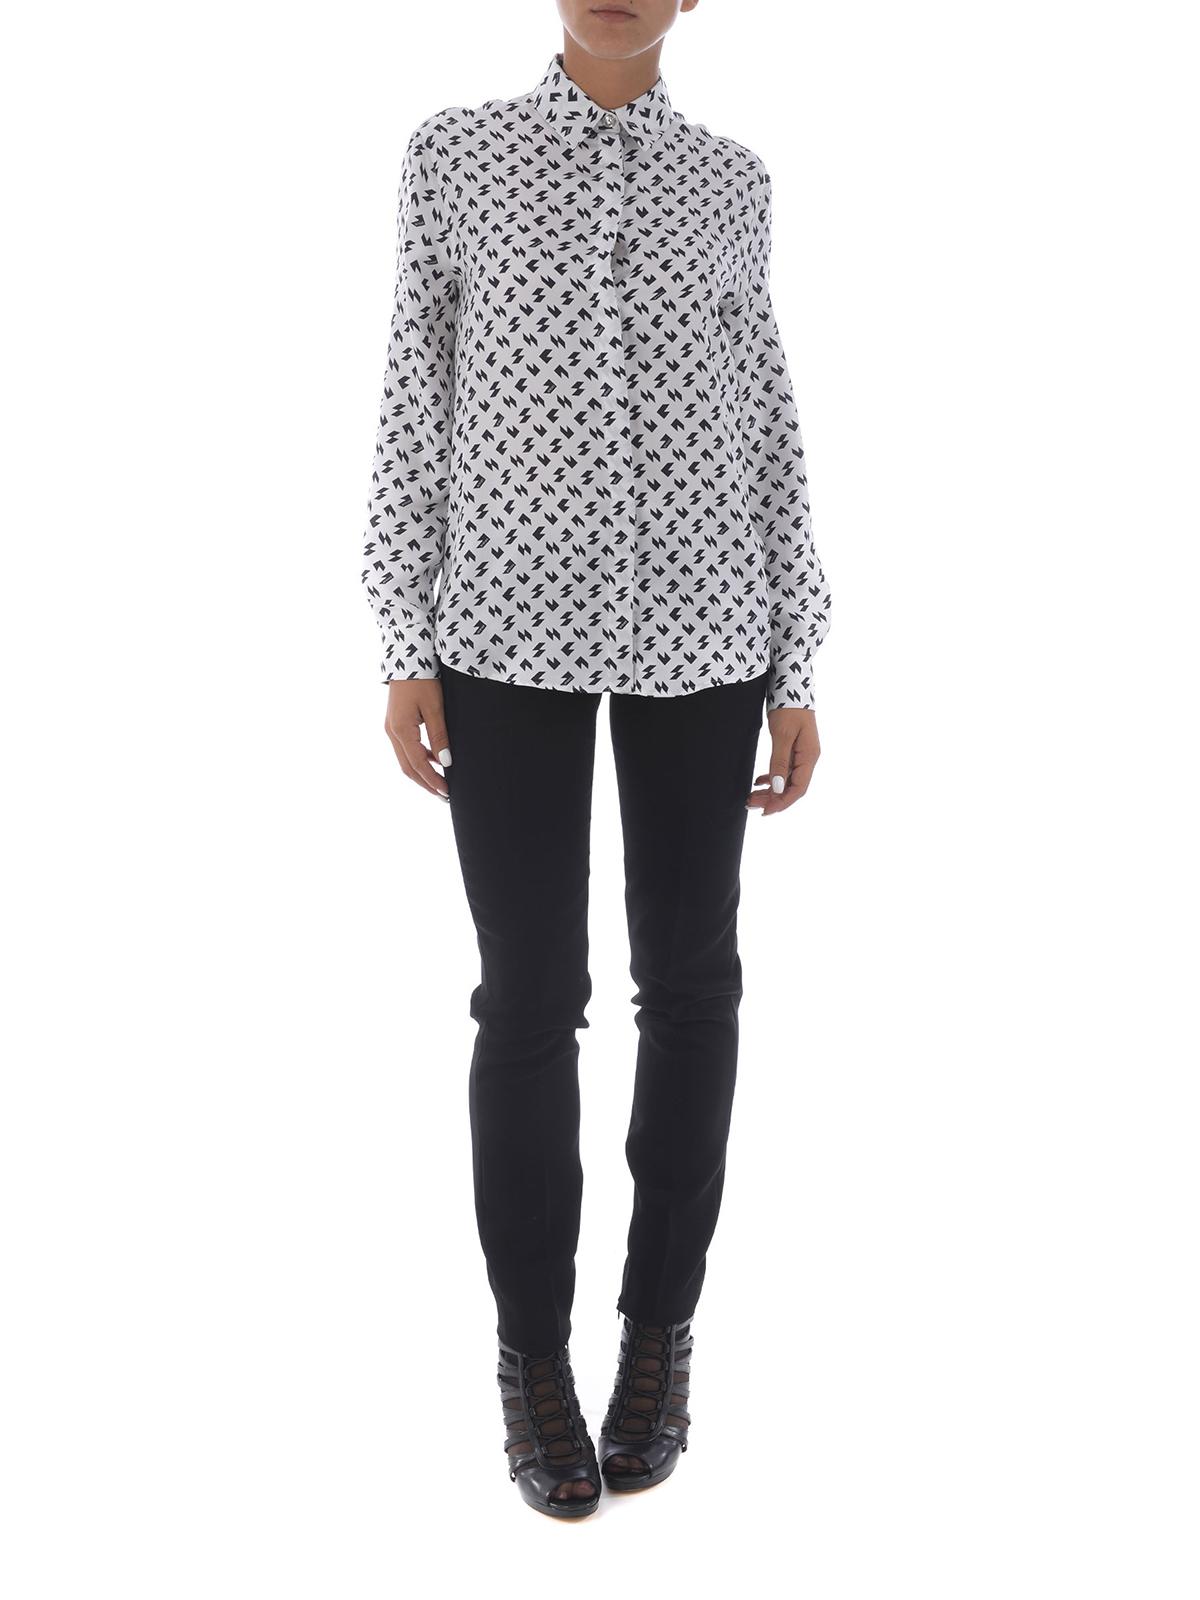 92947a30bf3fa7 Versus versace online shirts geometric patterned silk shirt jpg 1200x1600 Patterned  silk shirt